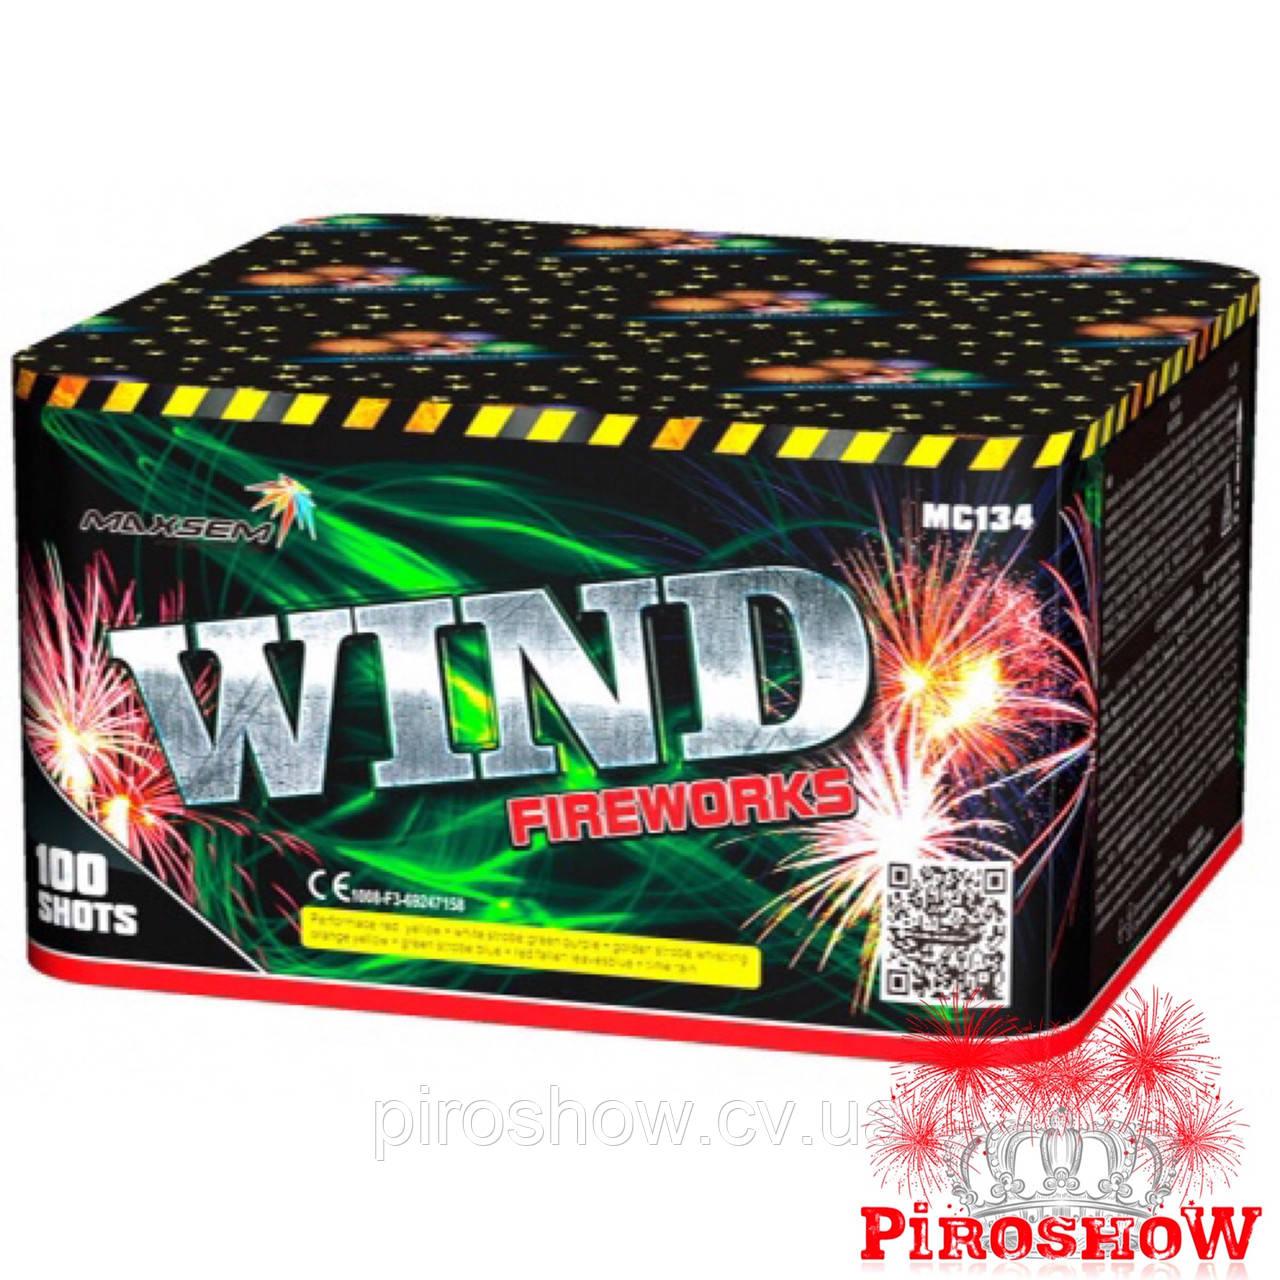 Салютная установка WIND FIREWORKS 100 выстрелов 20 калибр | Фейерверк MC134 Maxsem